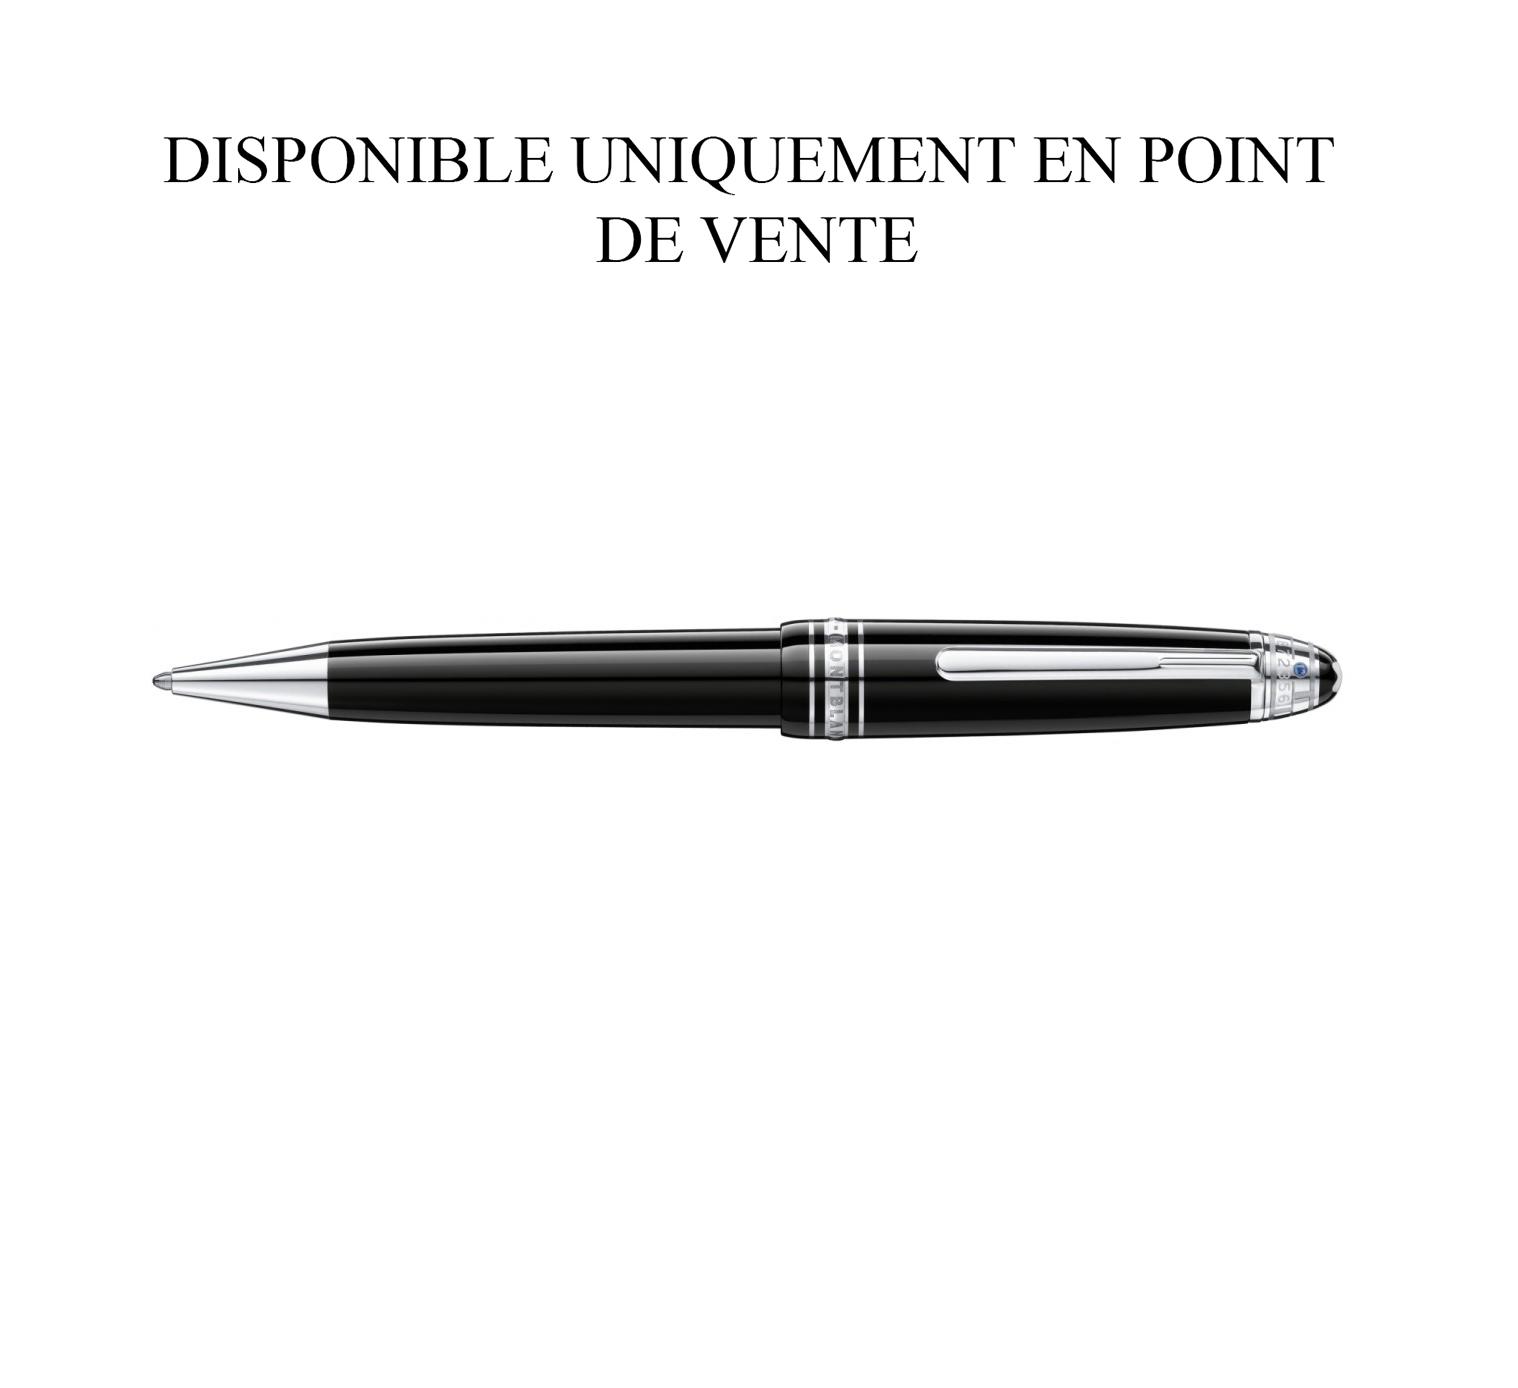 stylo montblanc marseille